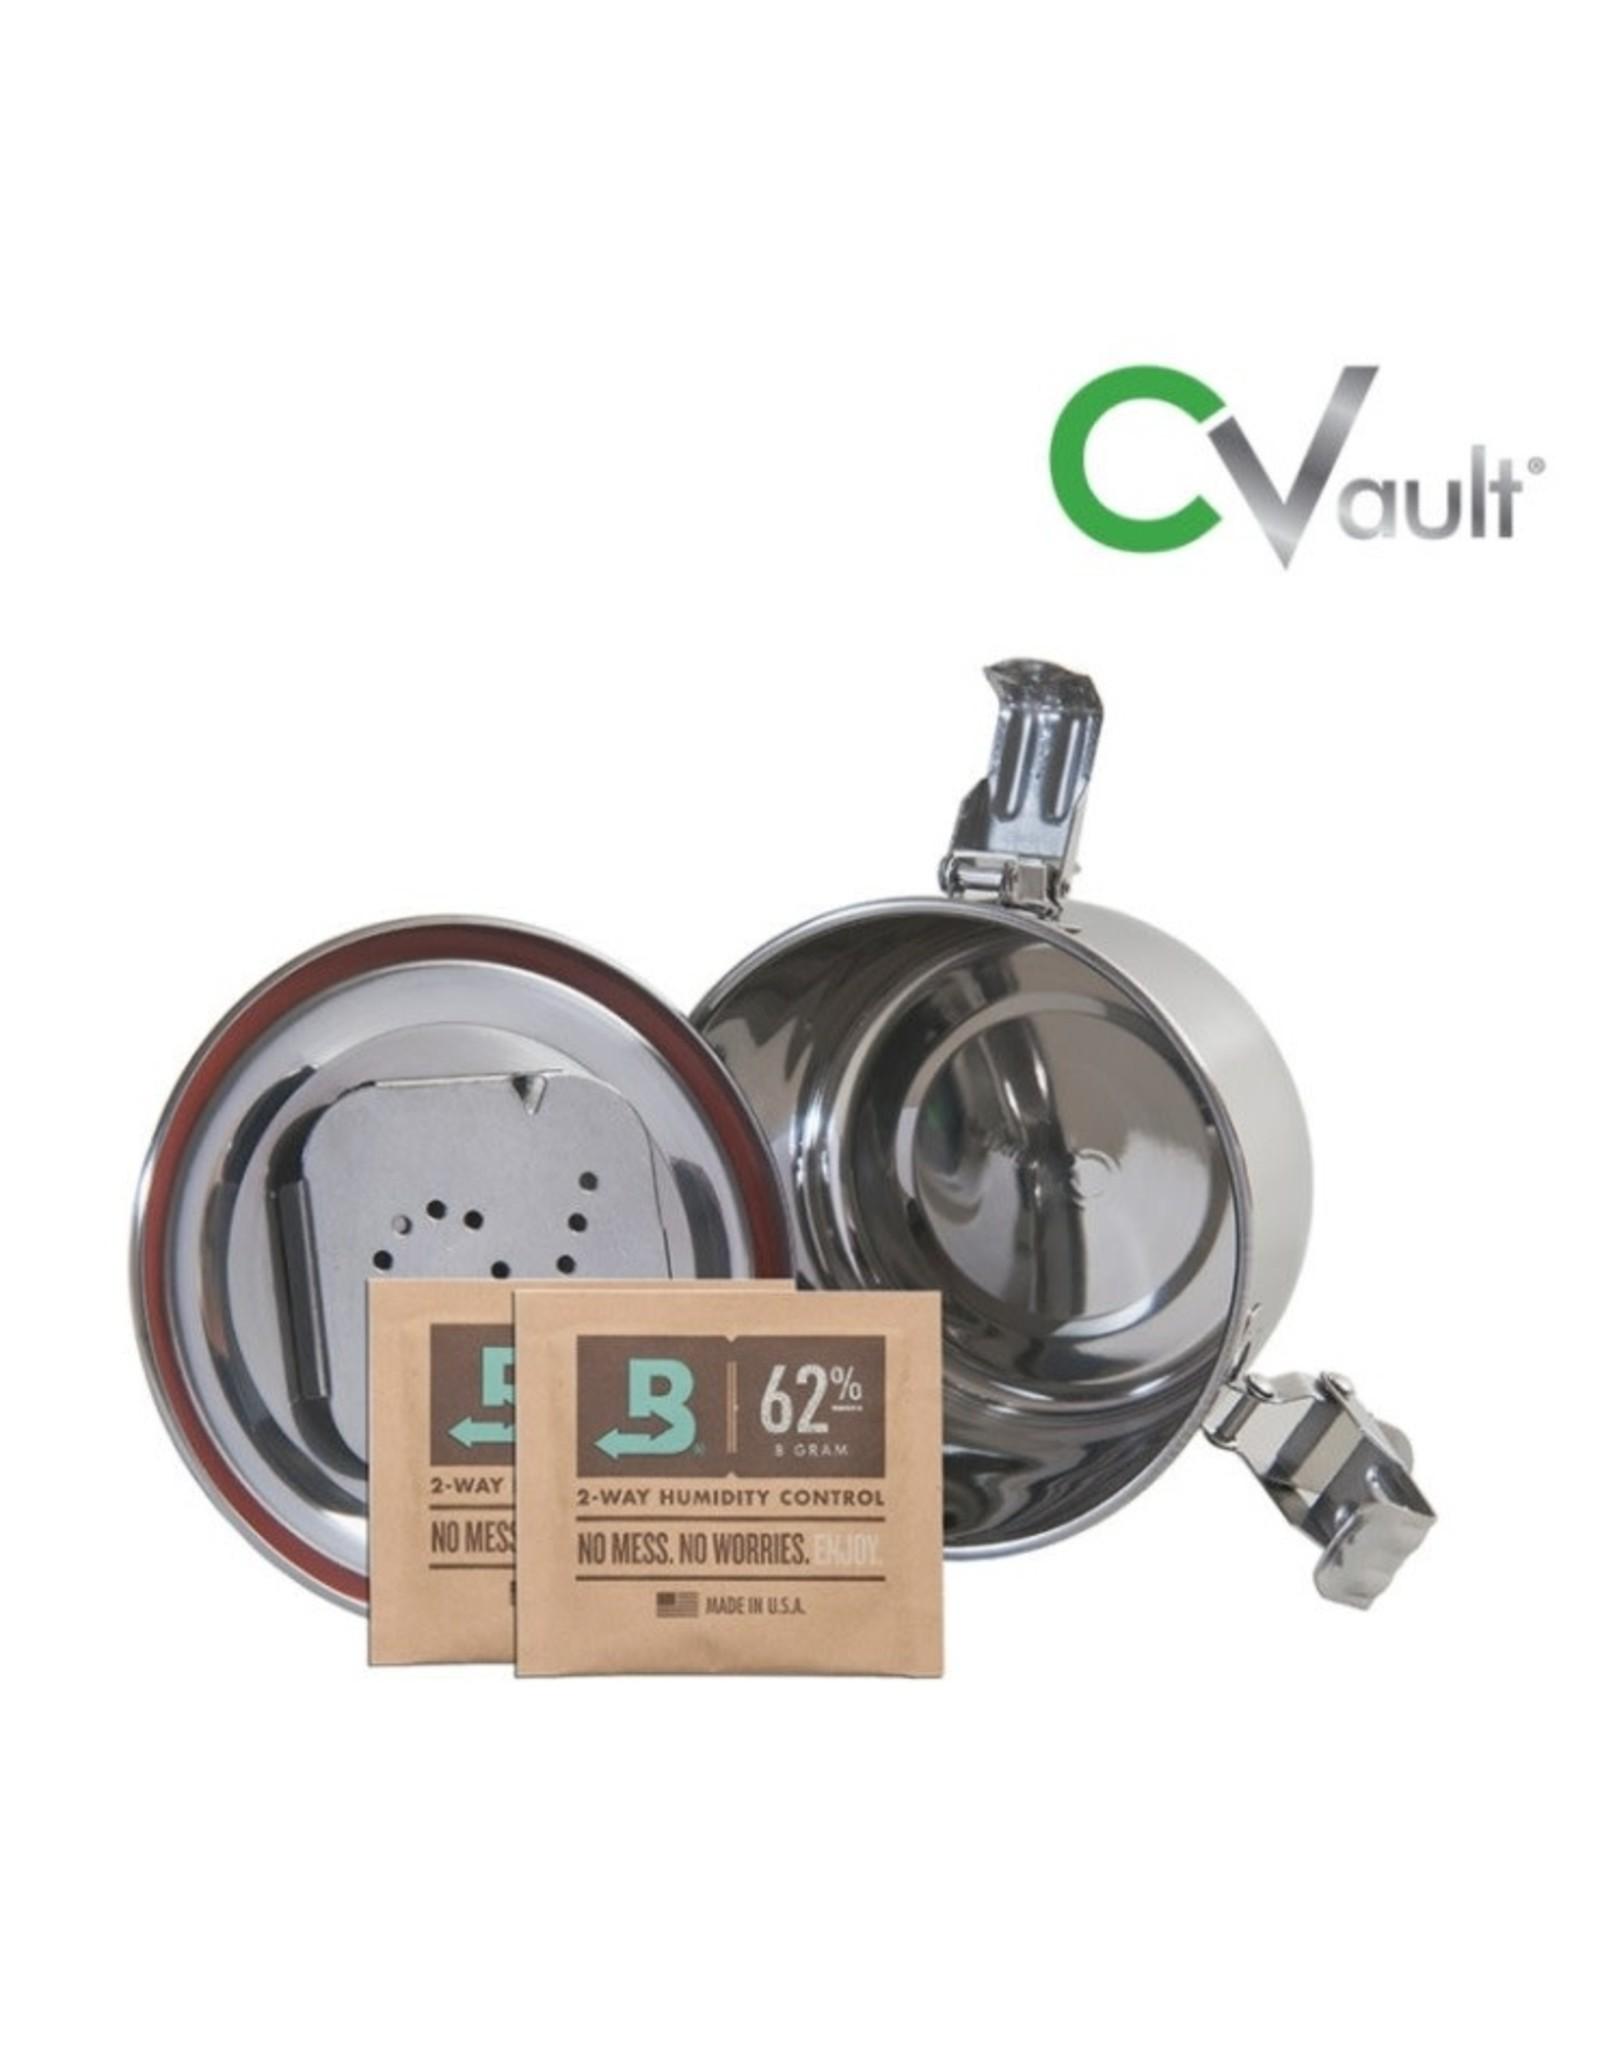 C VAULT C-VAULT STORAGE CONTAINER LARGE v2 – 1L